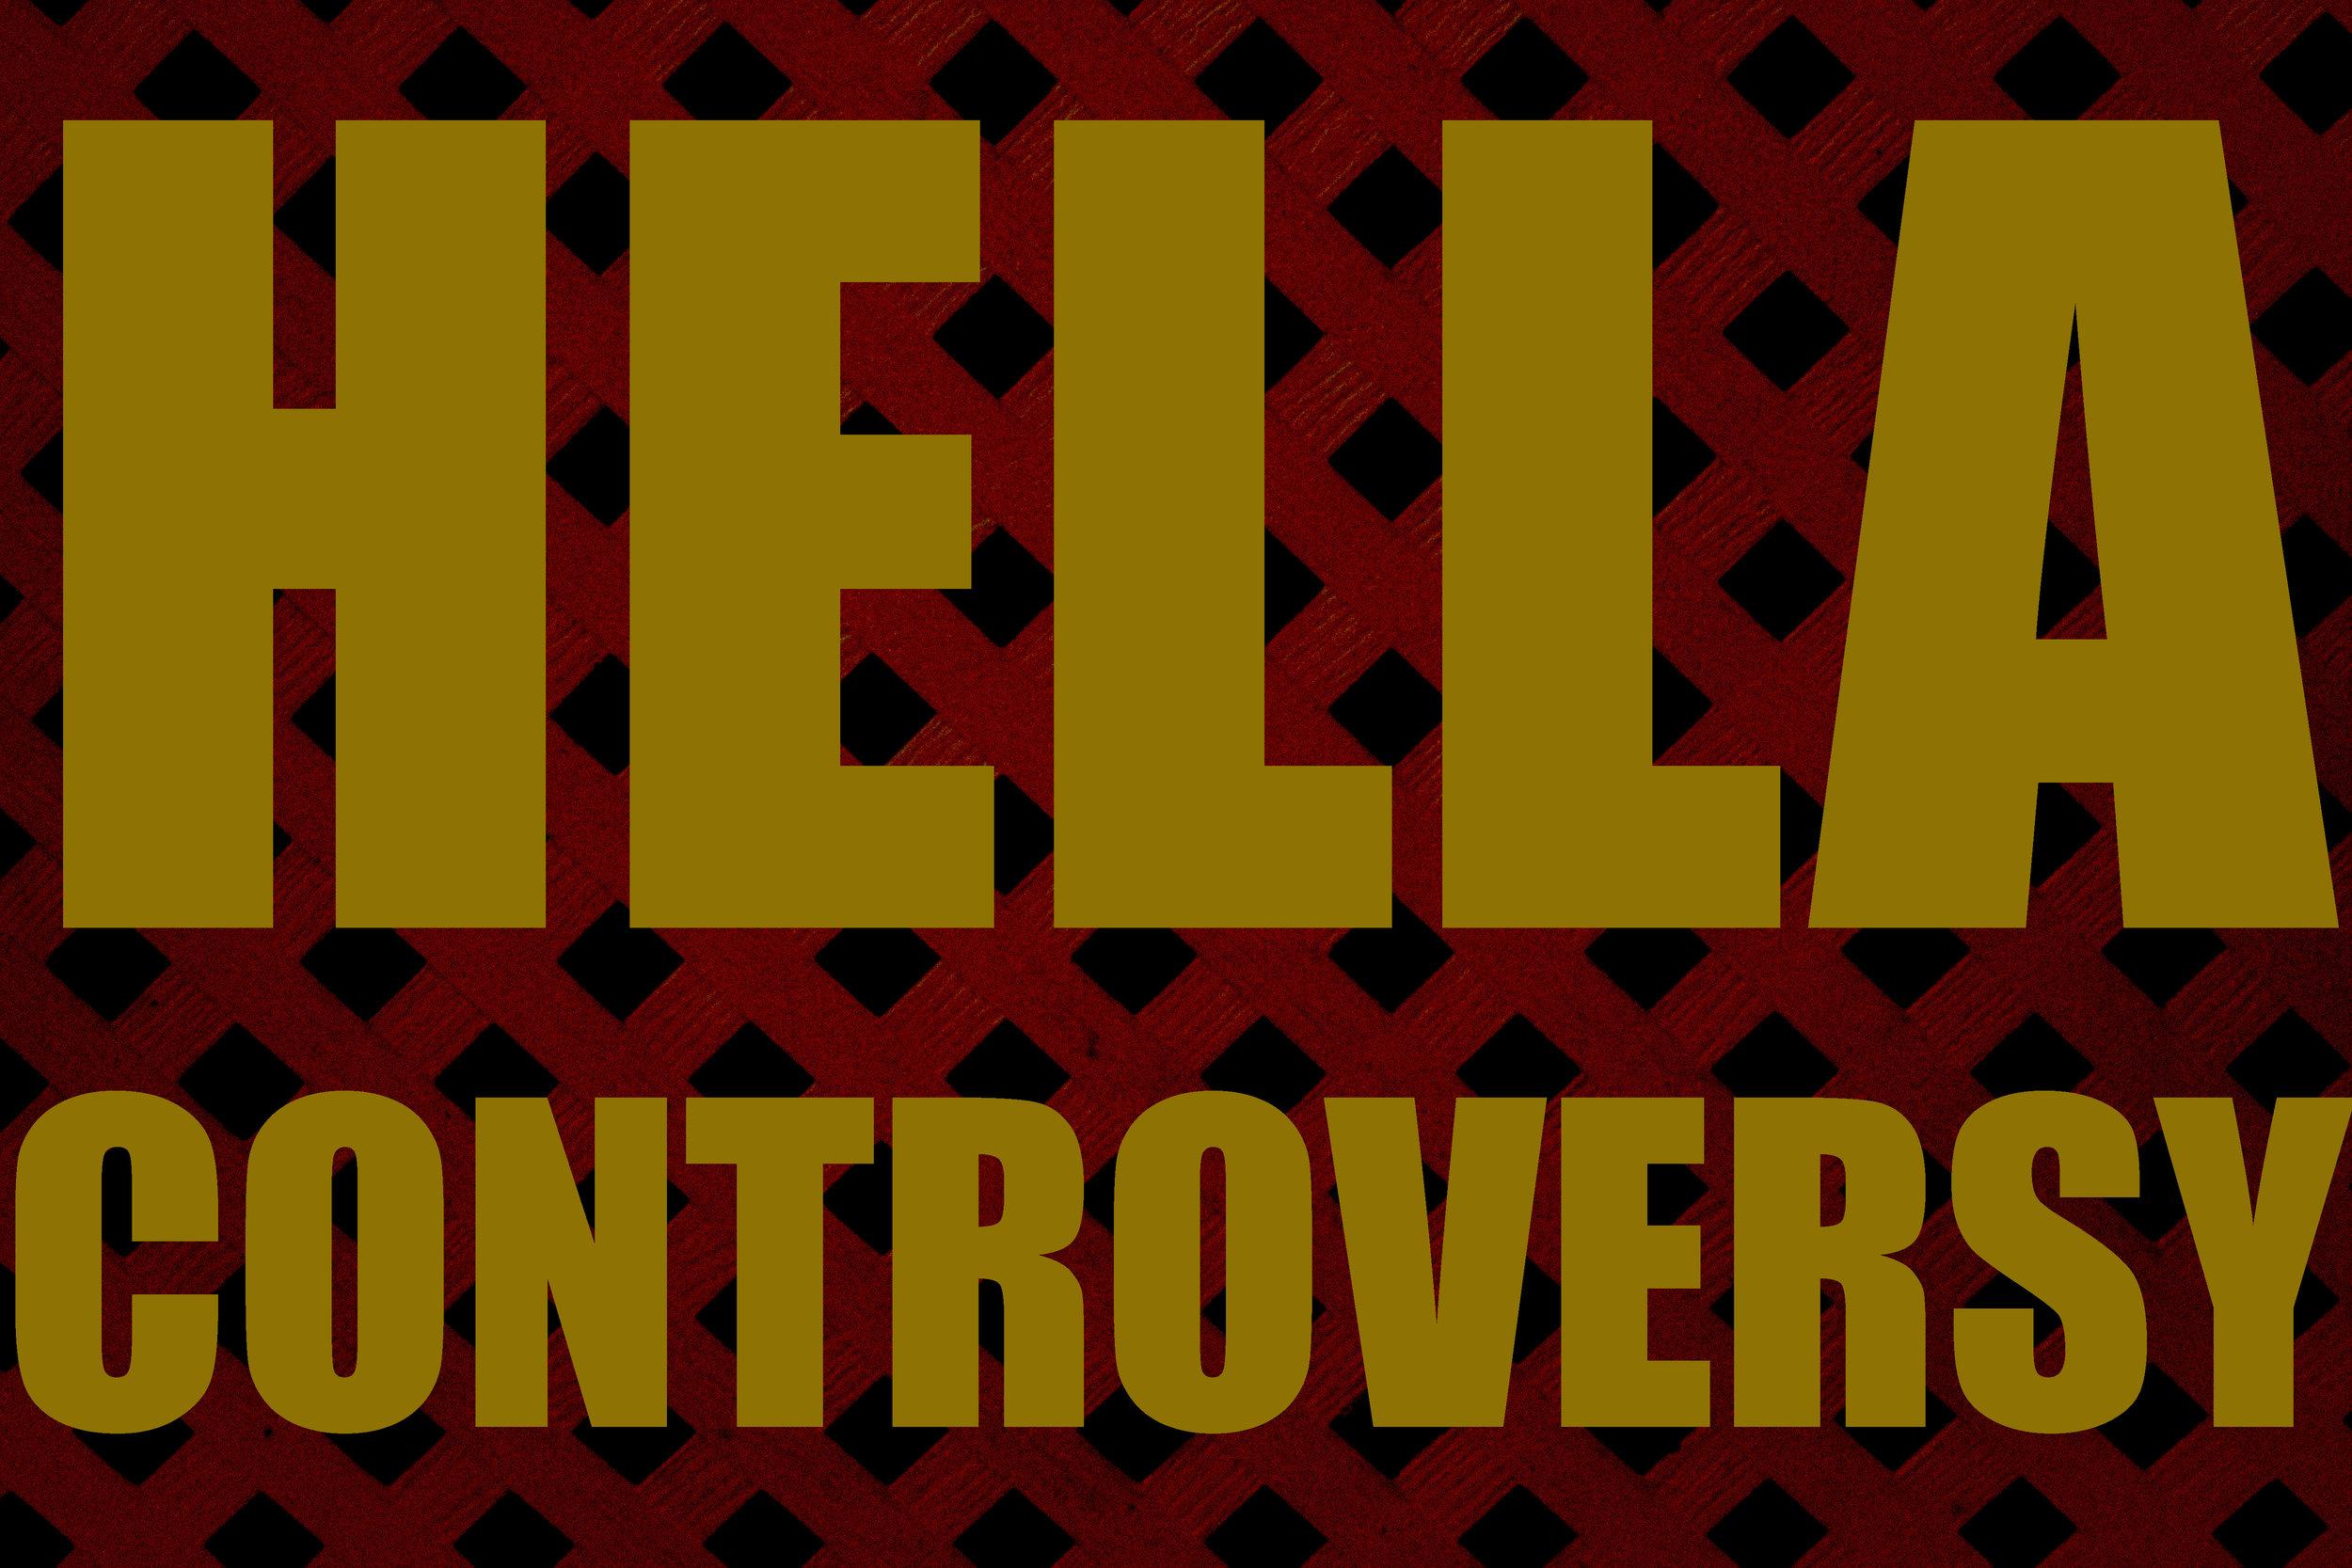 hellacontroversy.jpg